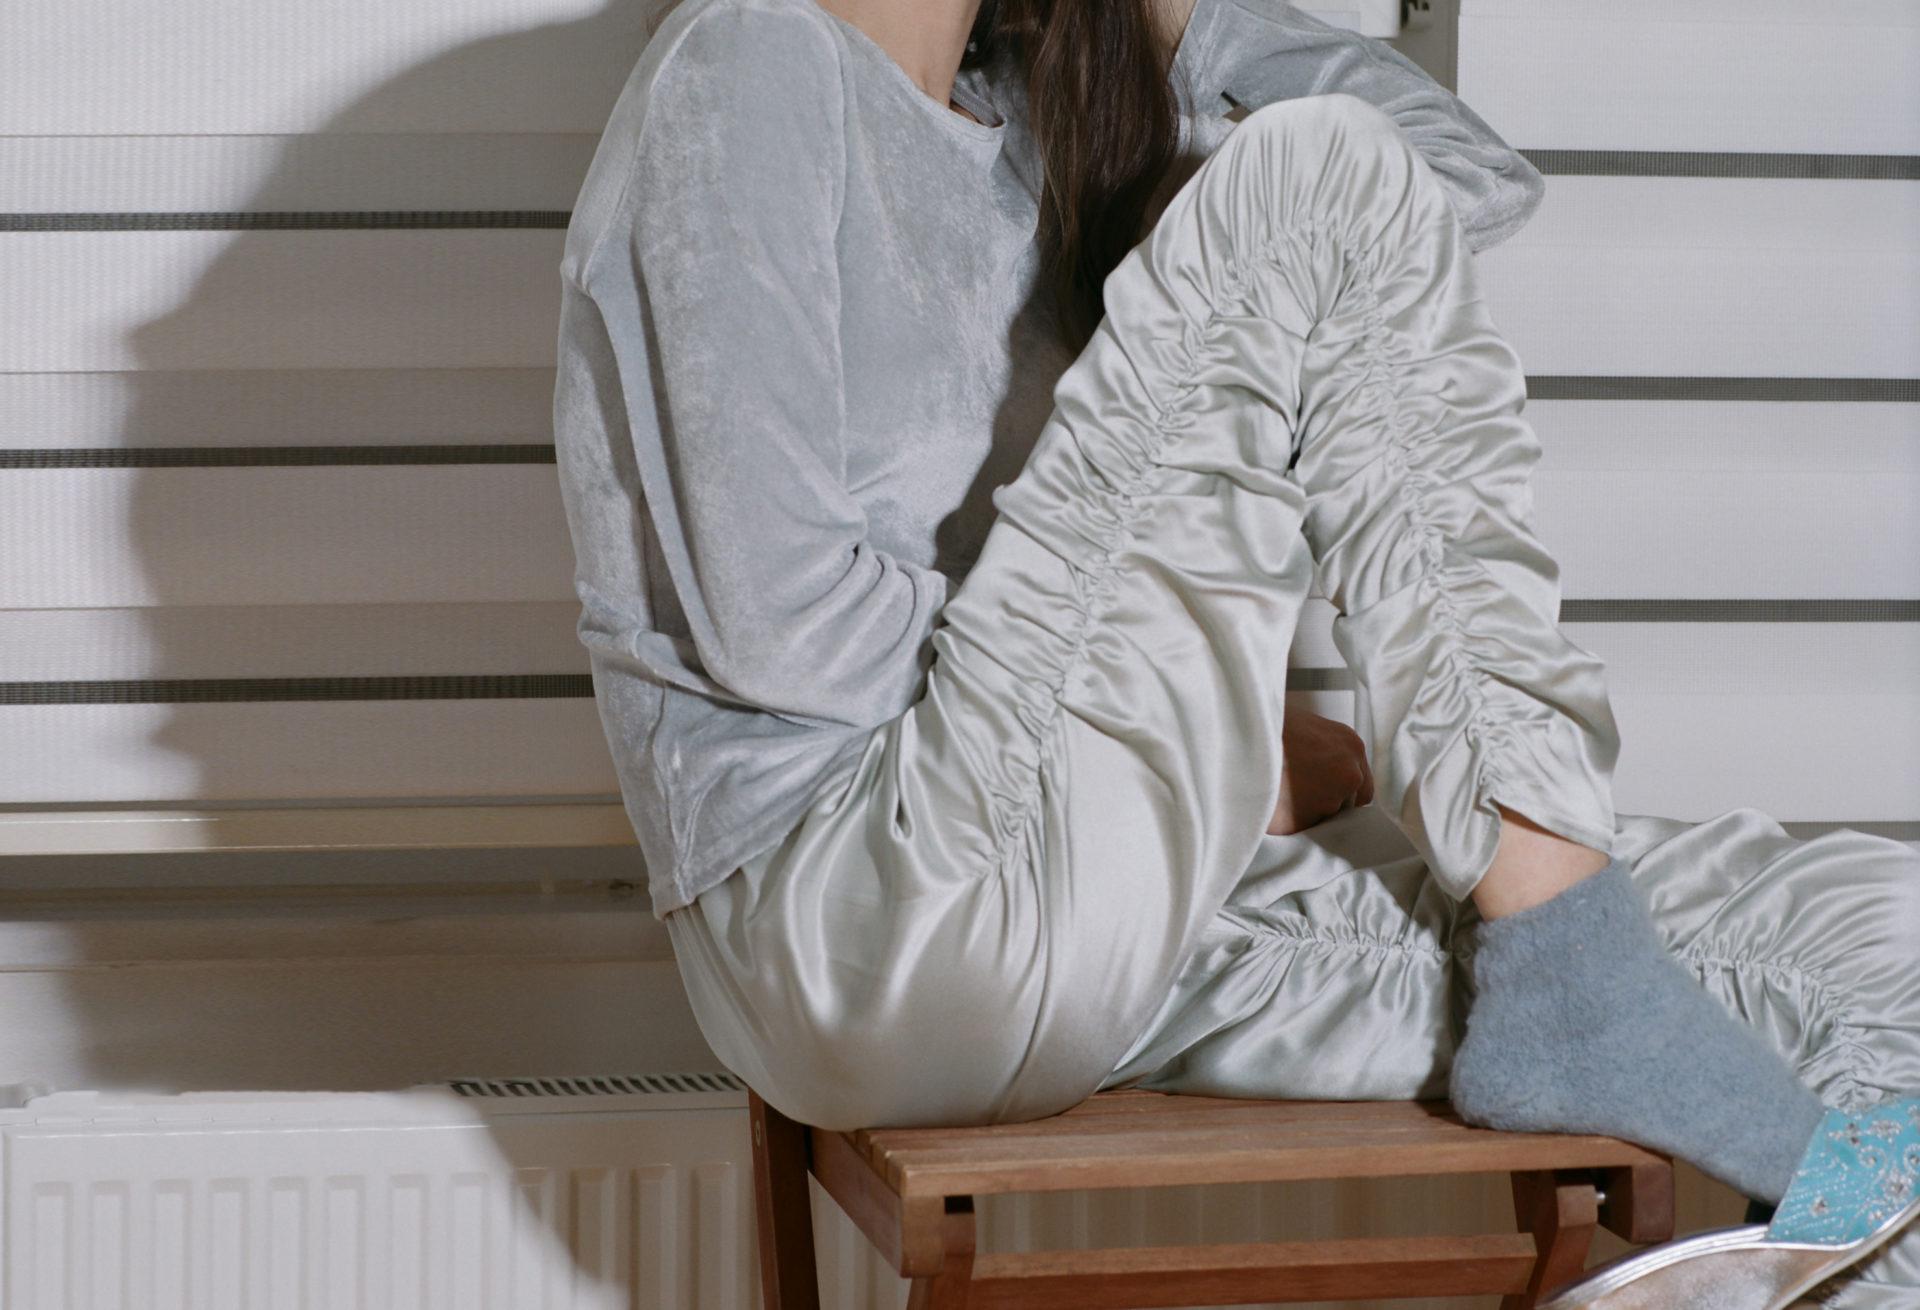 preview-nador-pants-dusty-blue-silk-satin-sahar-longsleeve-silver-shiny-velour-buckle-ankle-socks-dusty-blue-cotton-aw16-13370011-copy-1920x1310